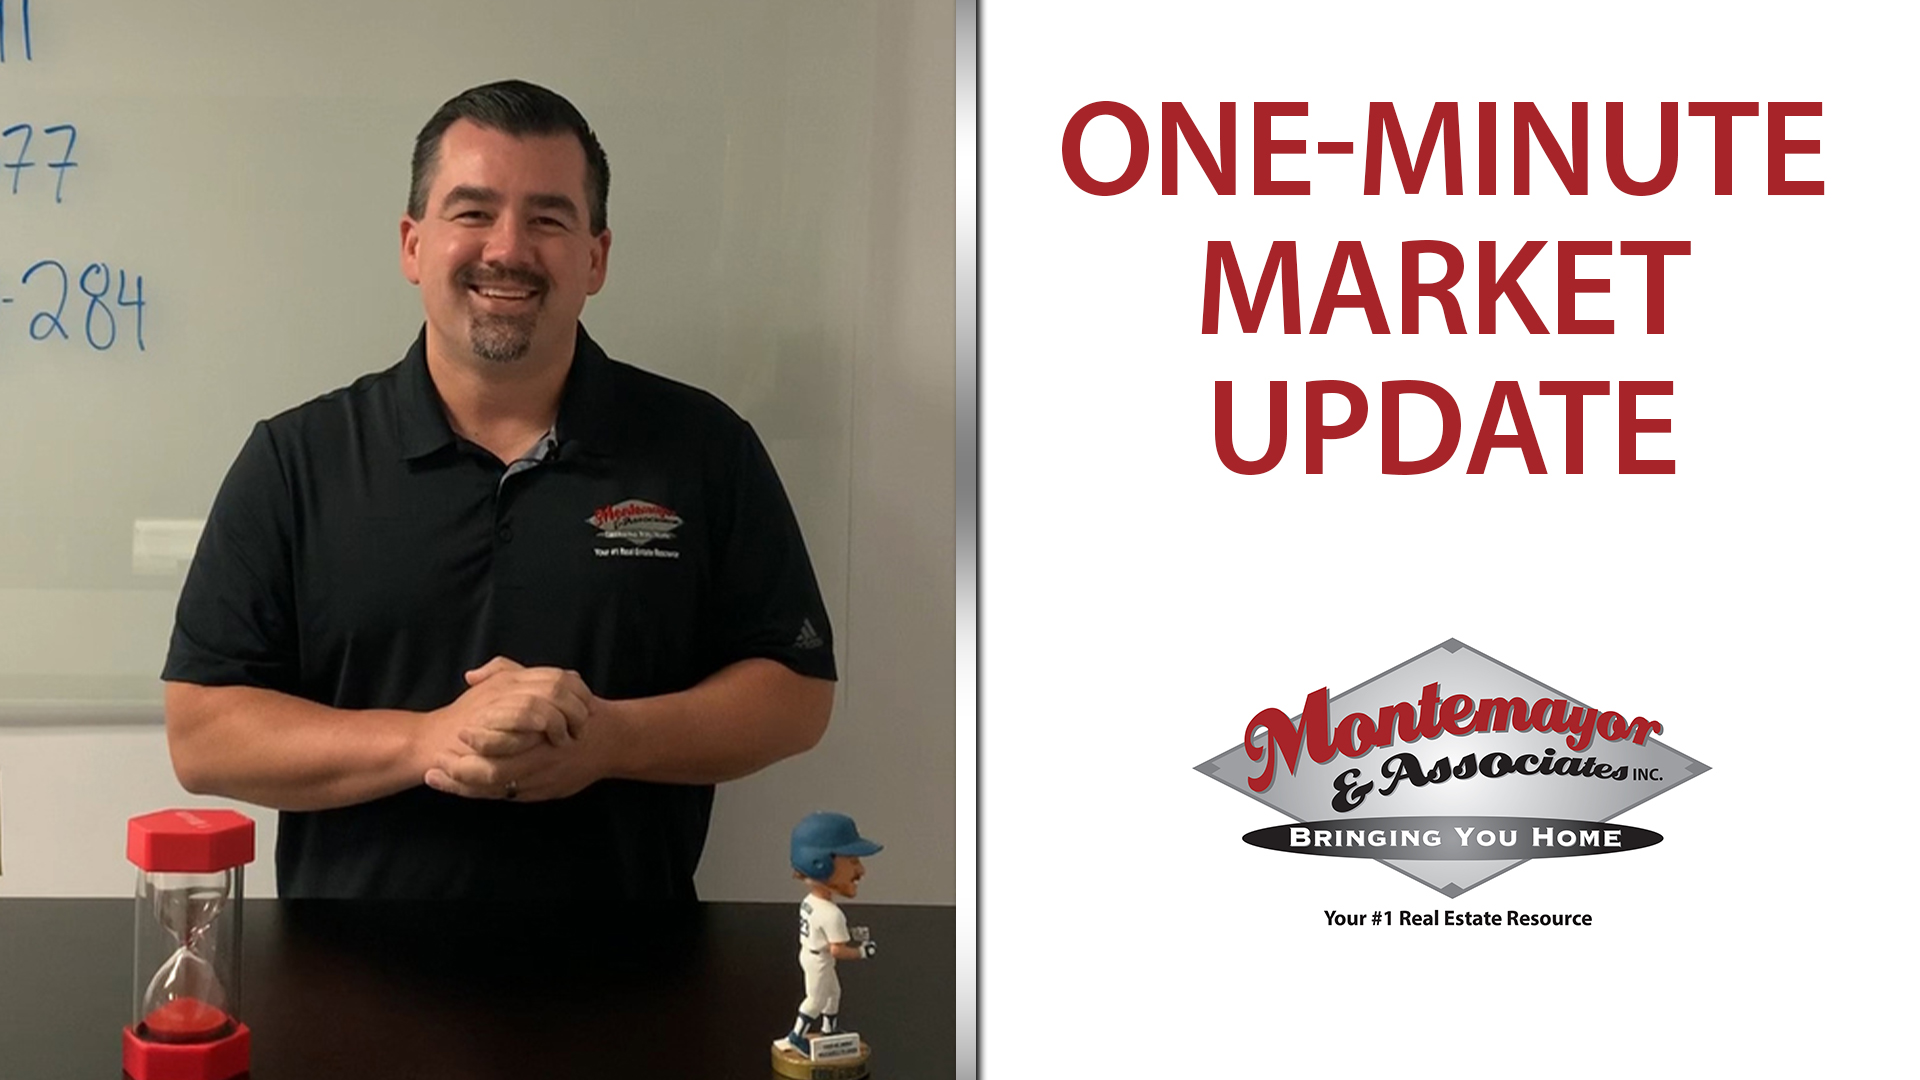 A November One-Minute Market Update